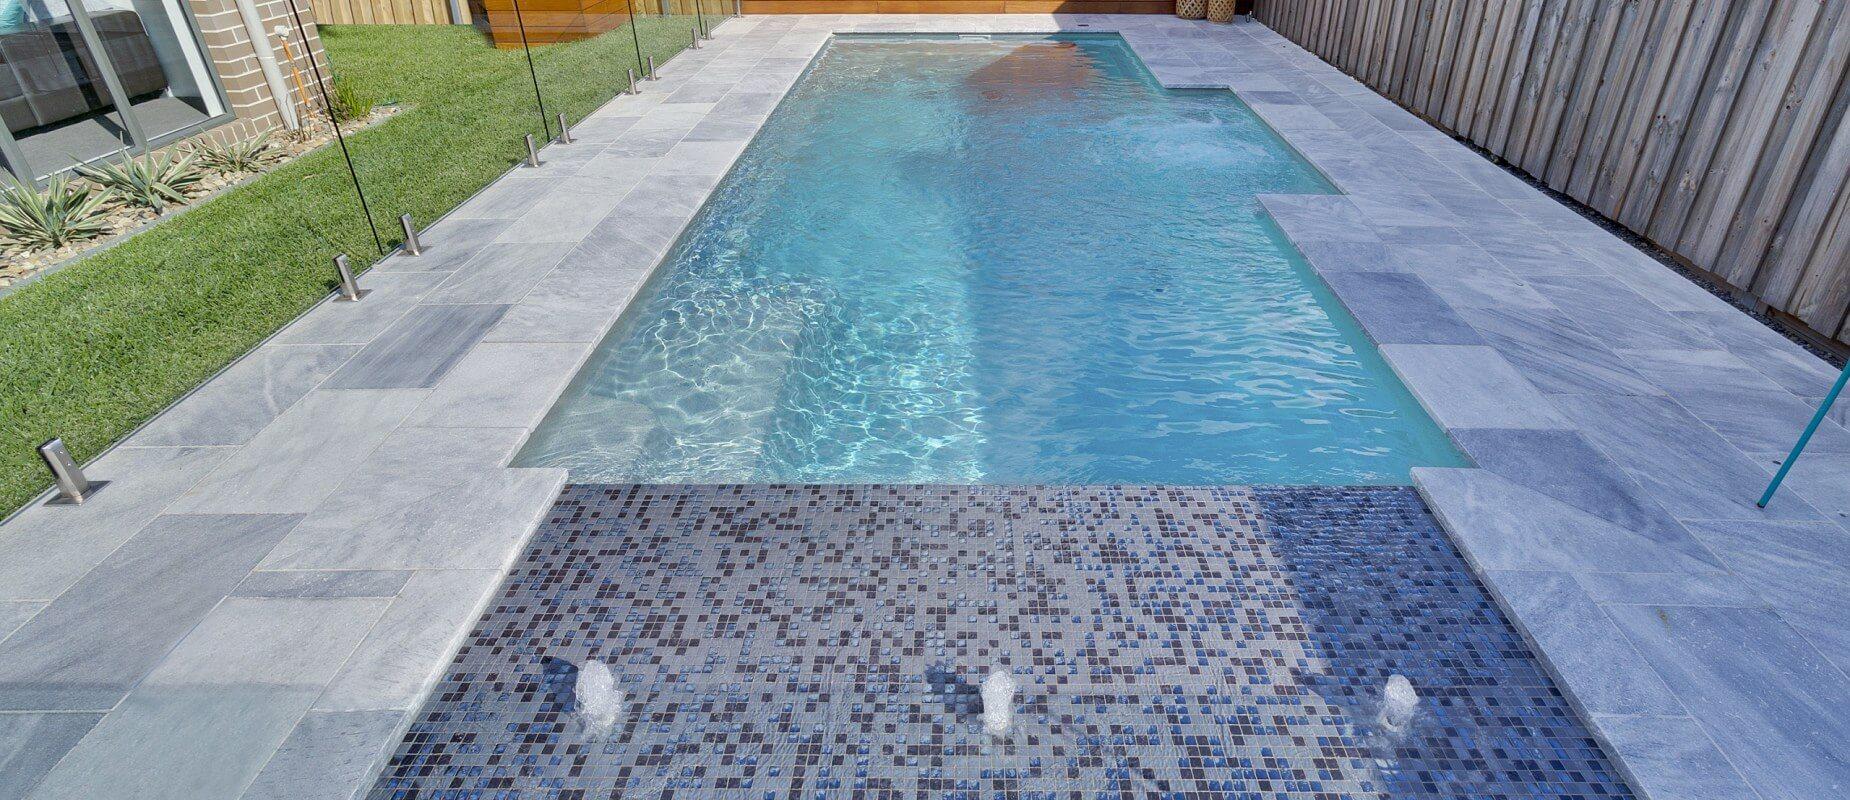 piscina de lux modele frumoase 42